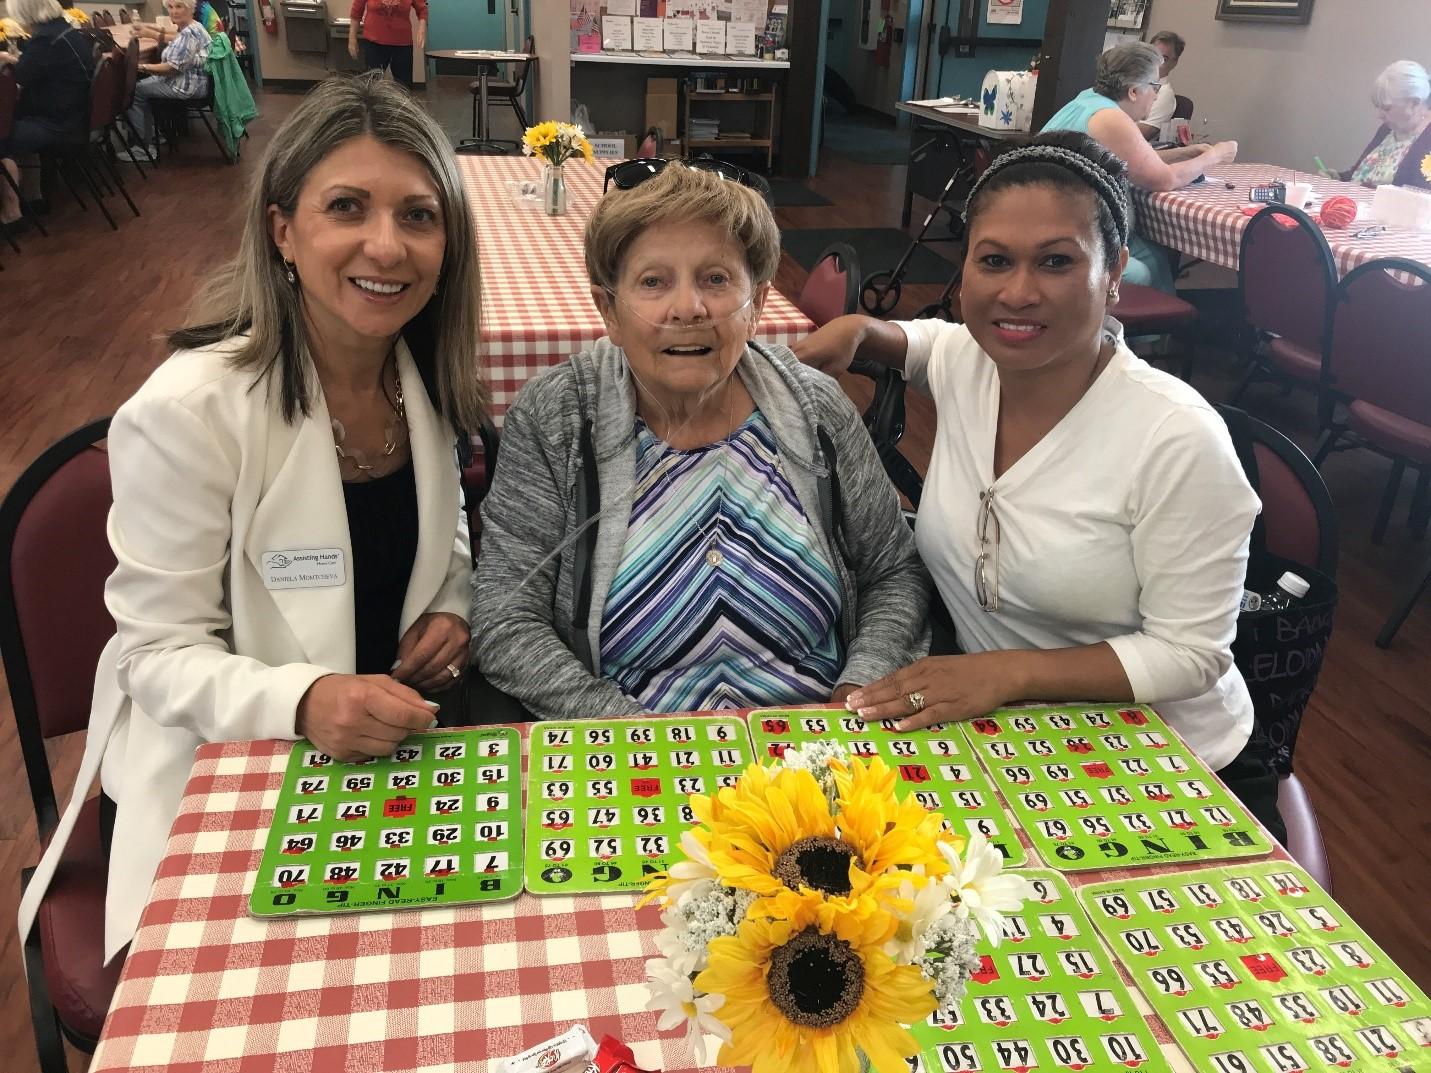 Assisting-Hands-Home-Care-Schaumburg-Sponsors-Bingo